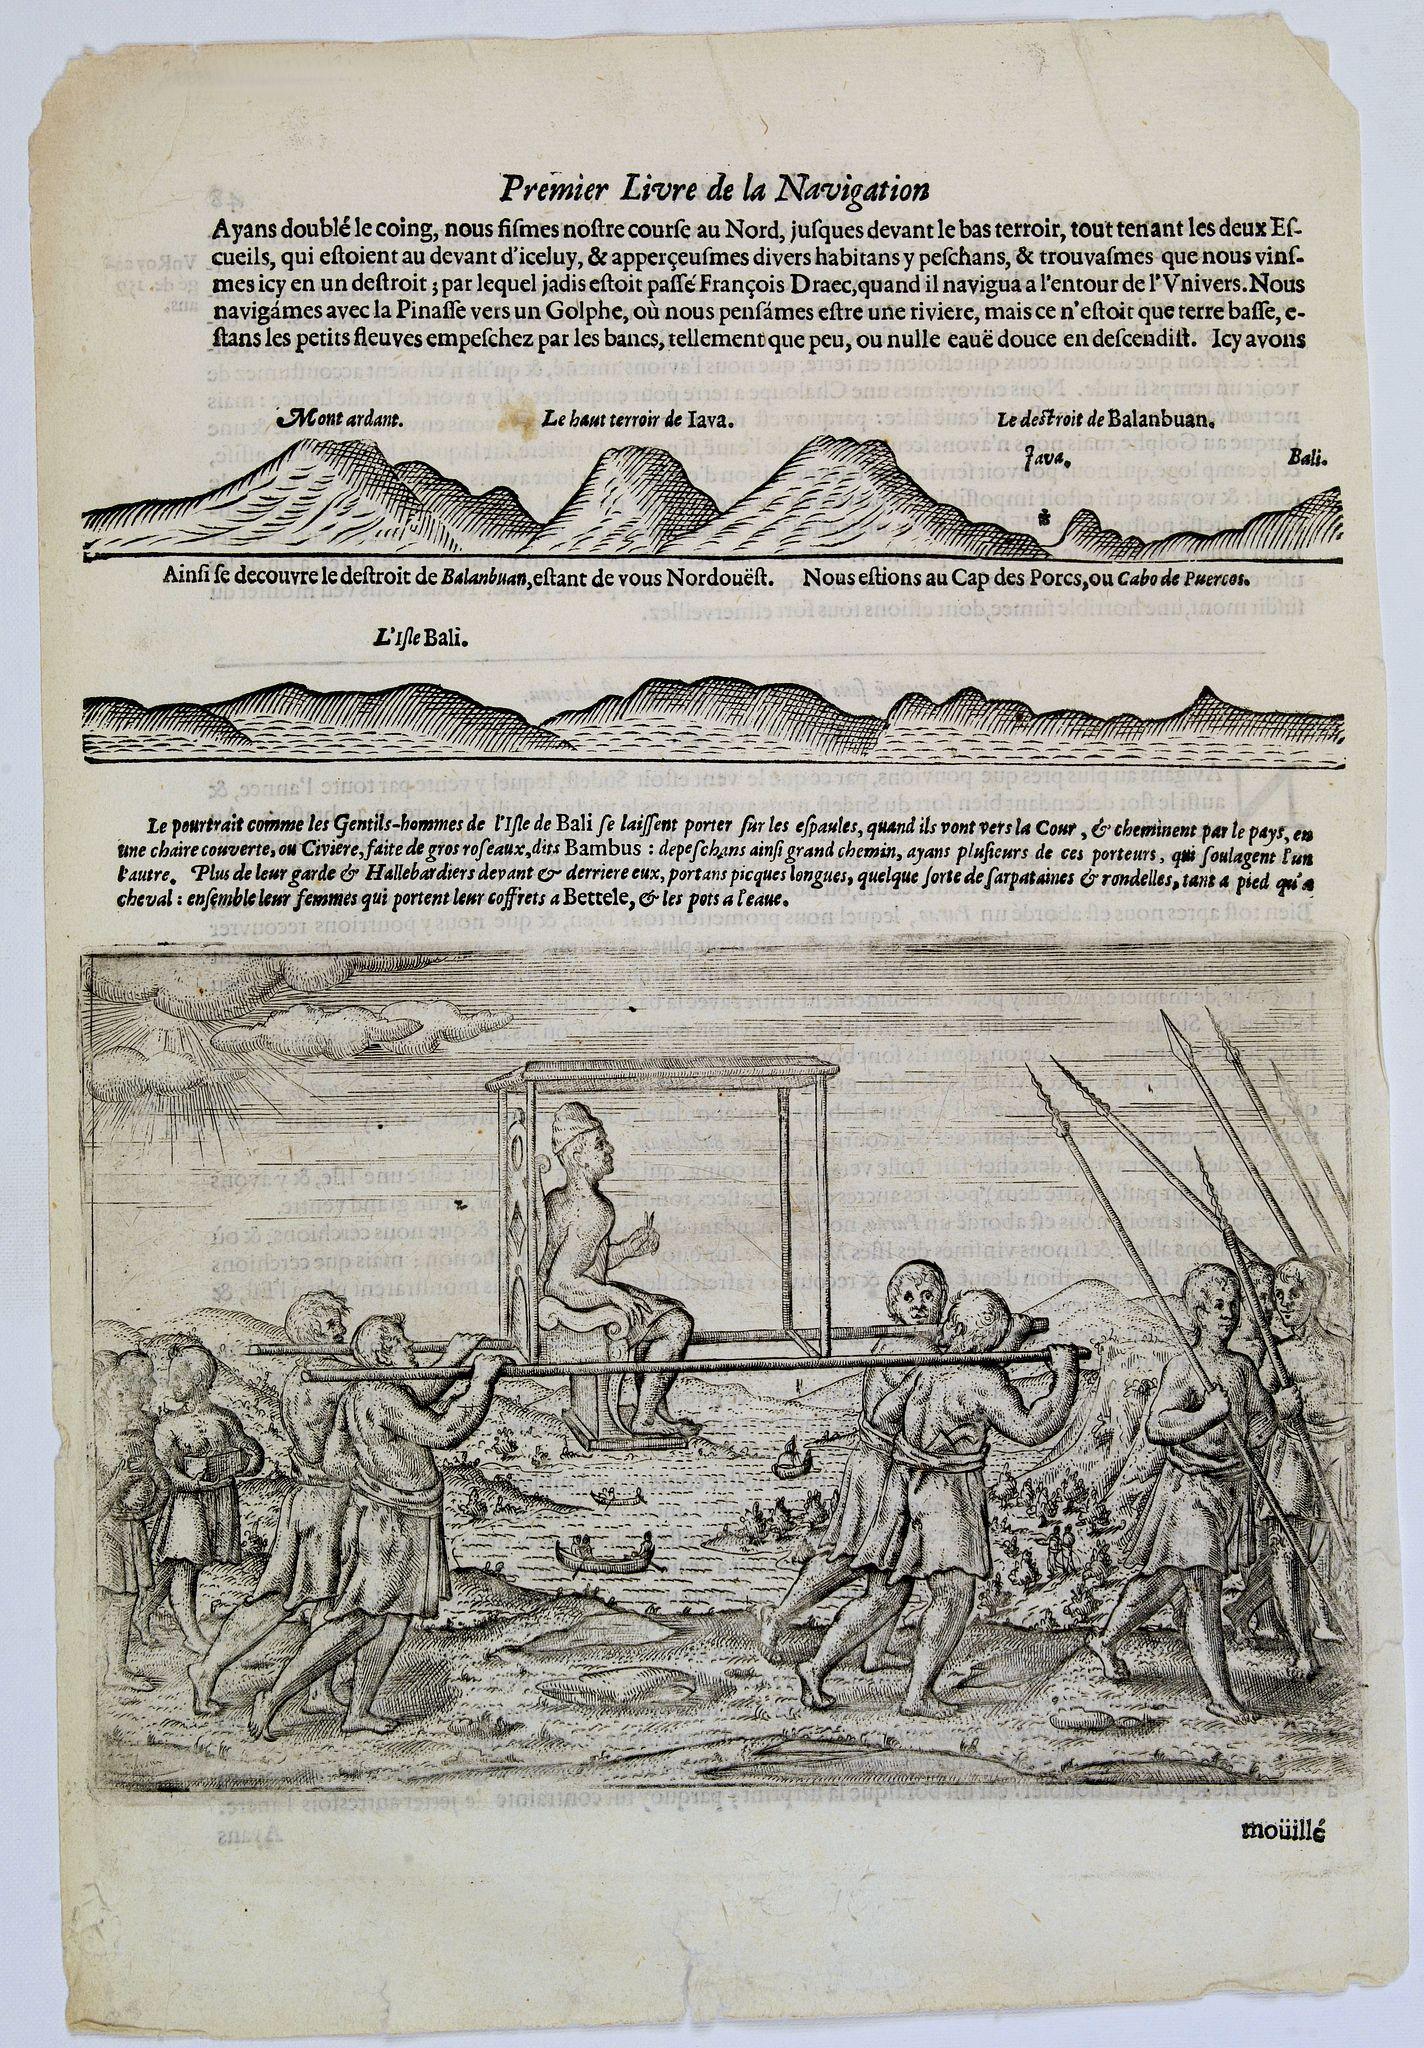 LODEWYCKSZ, Willem -  [How the genteel folk of Bali are transported]